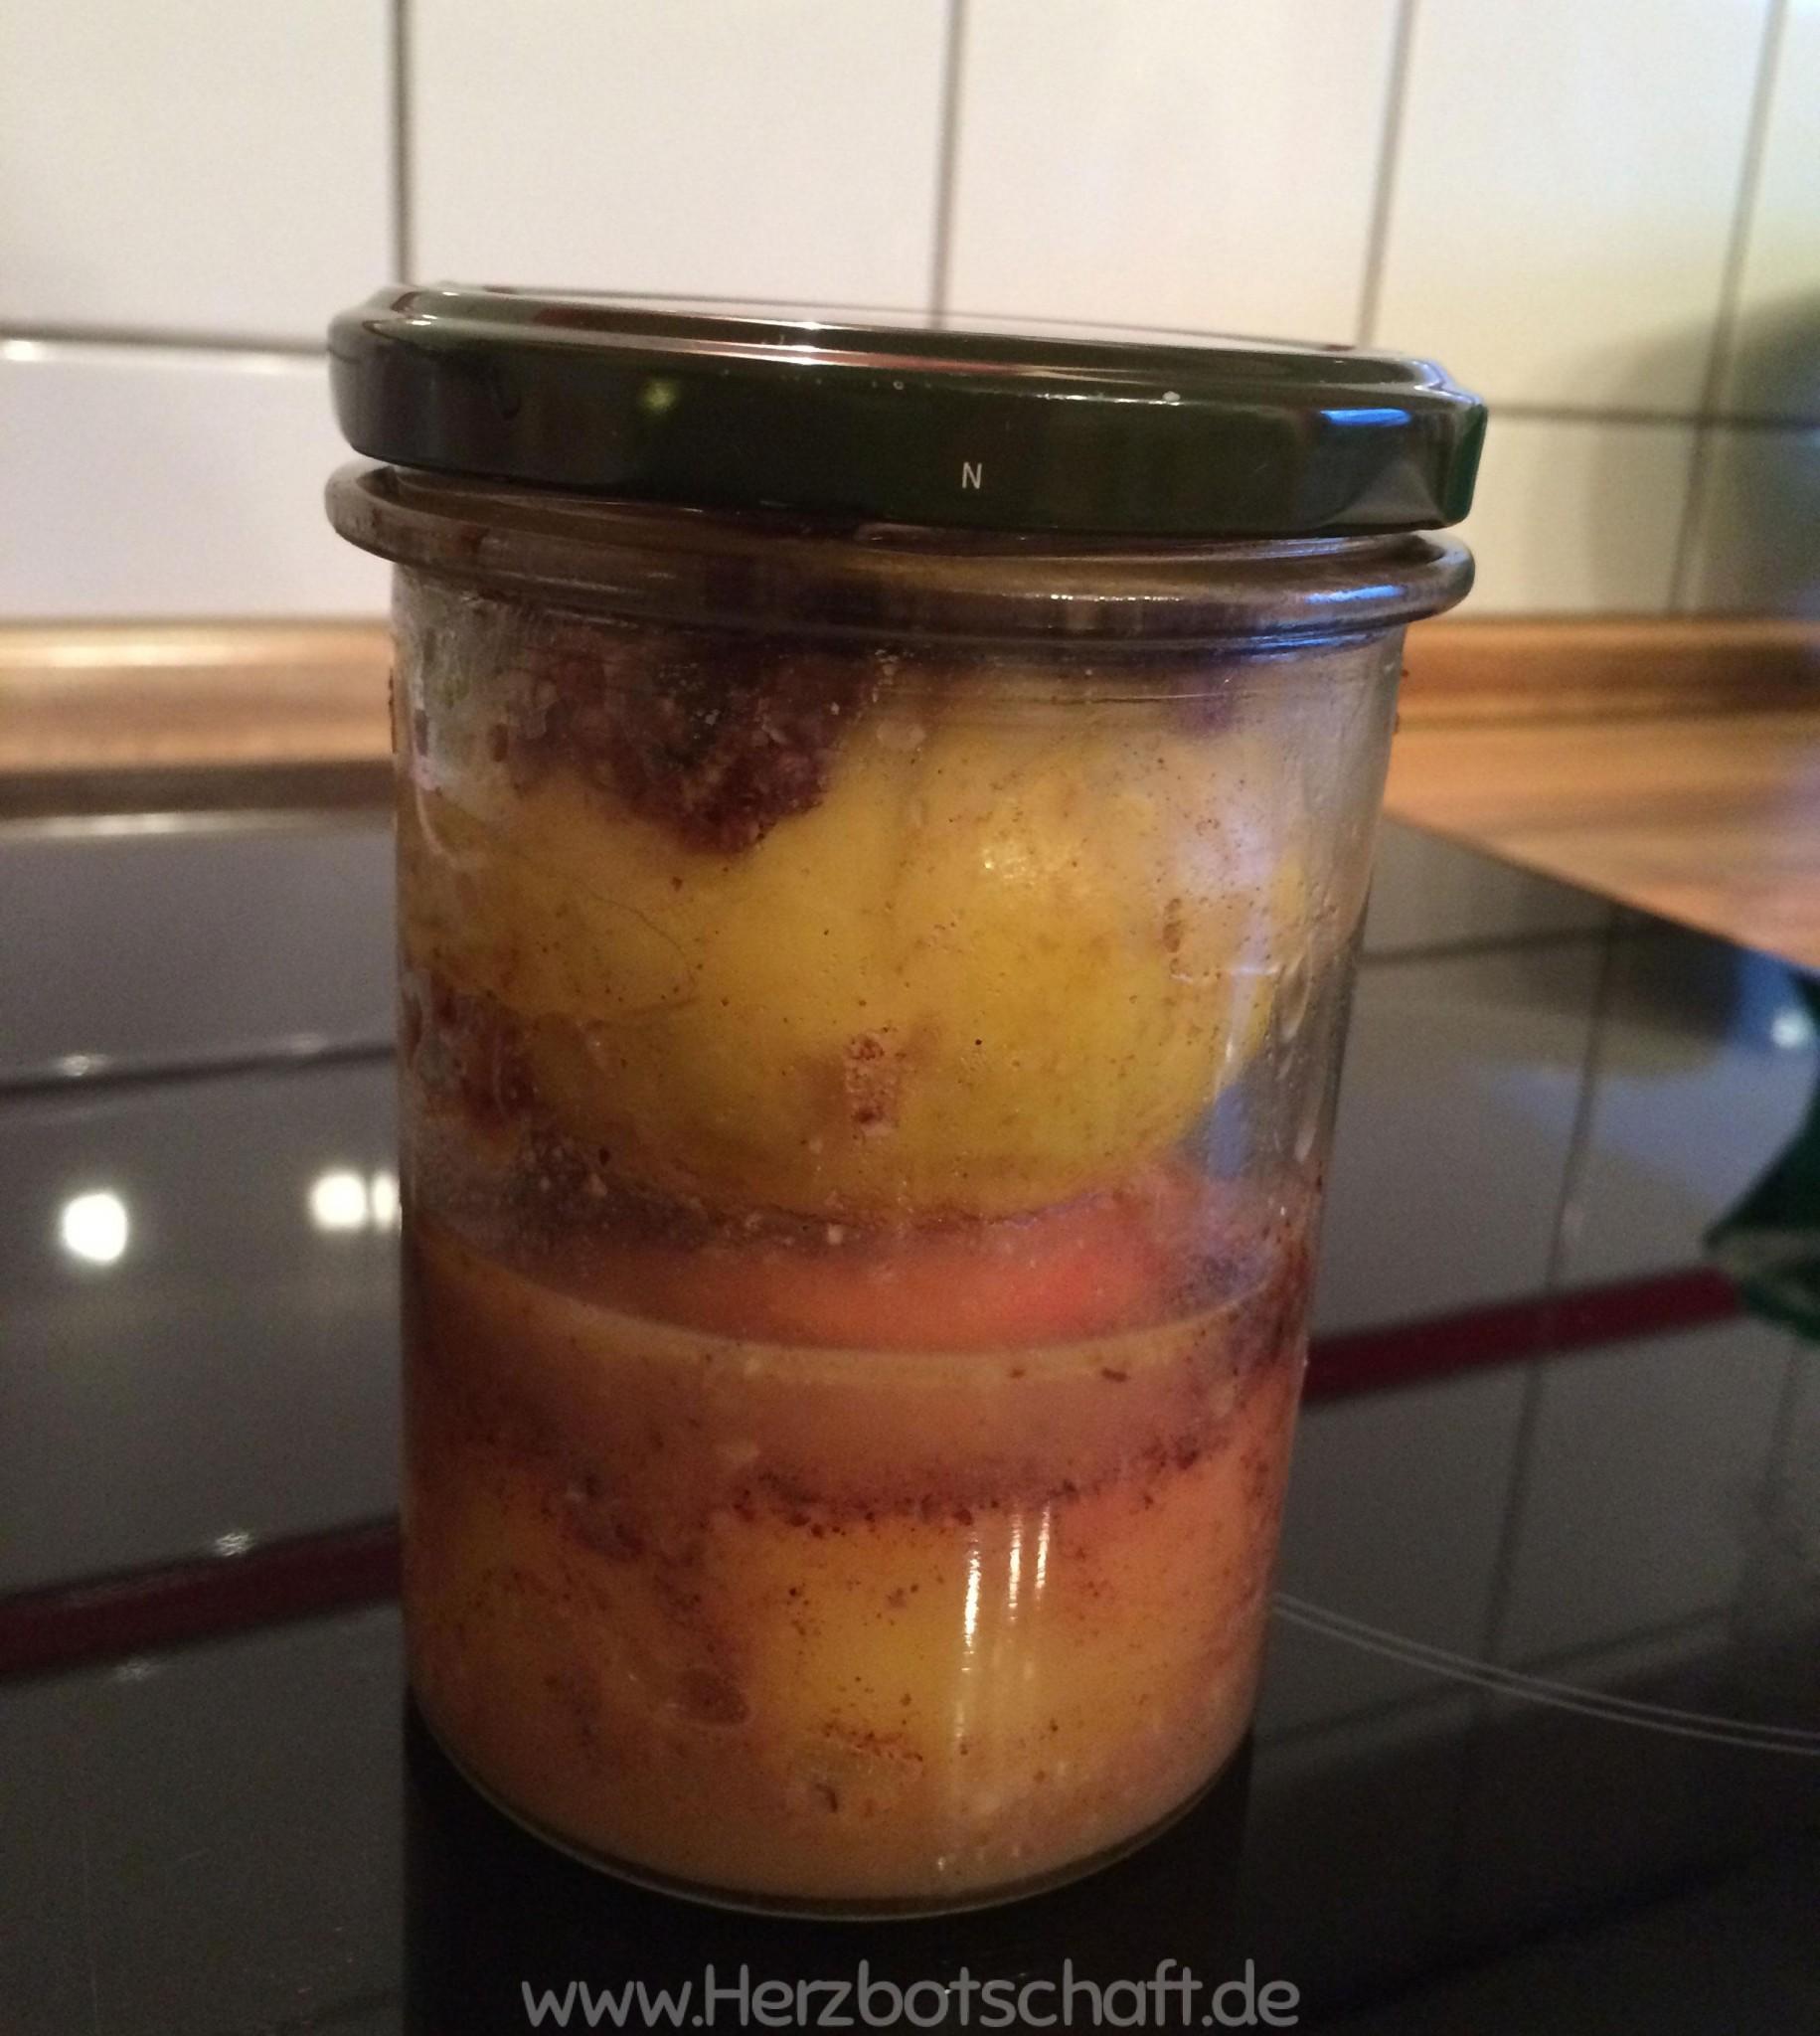 rezept-bratapfel-im-glas-mitbringsel